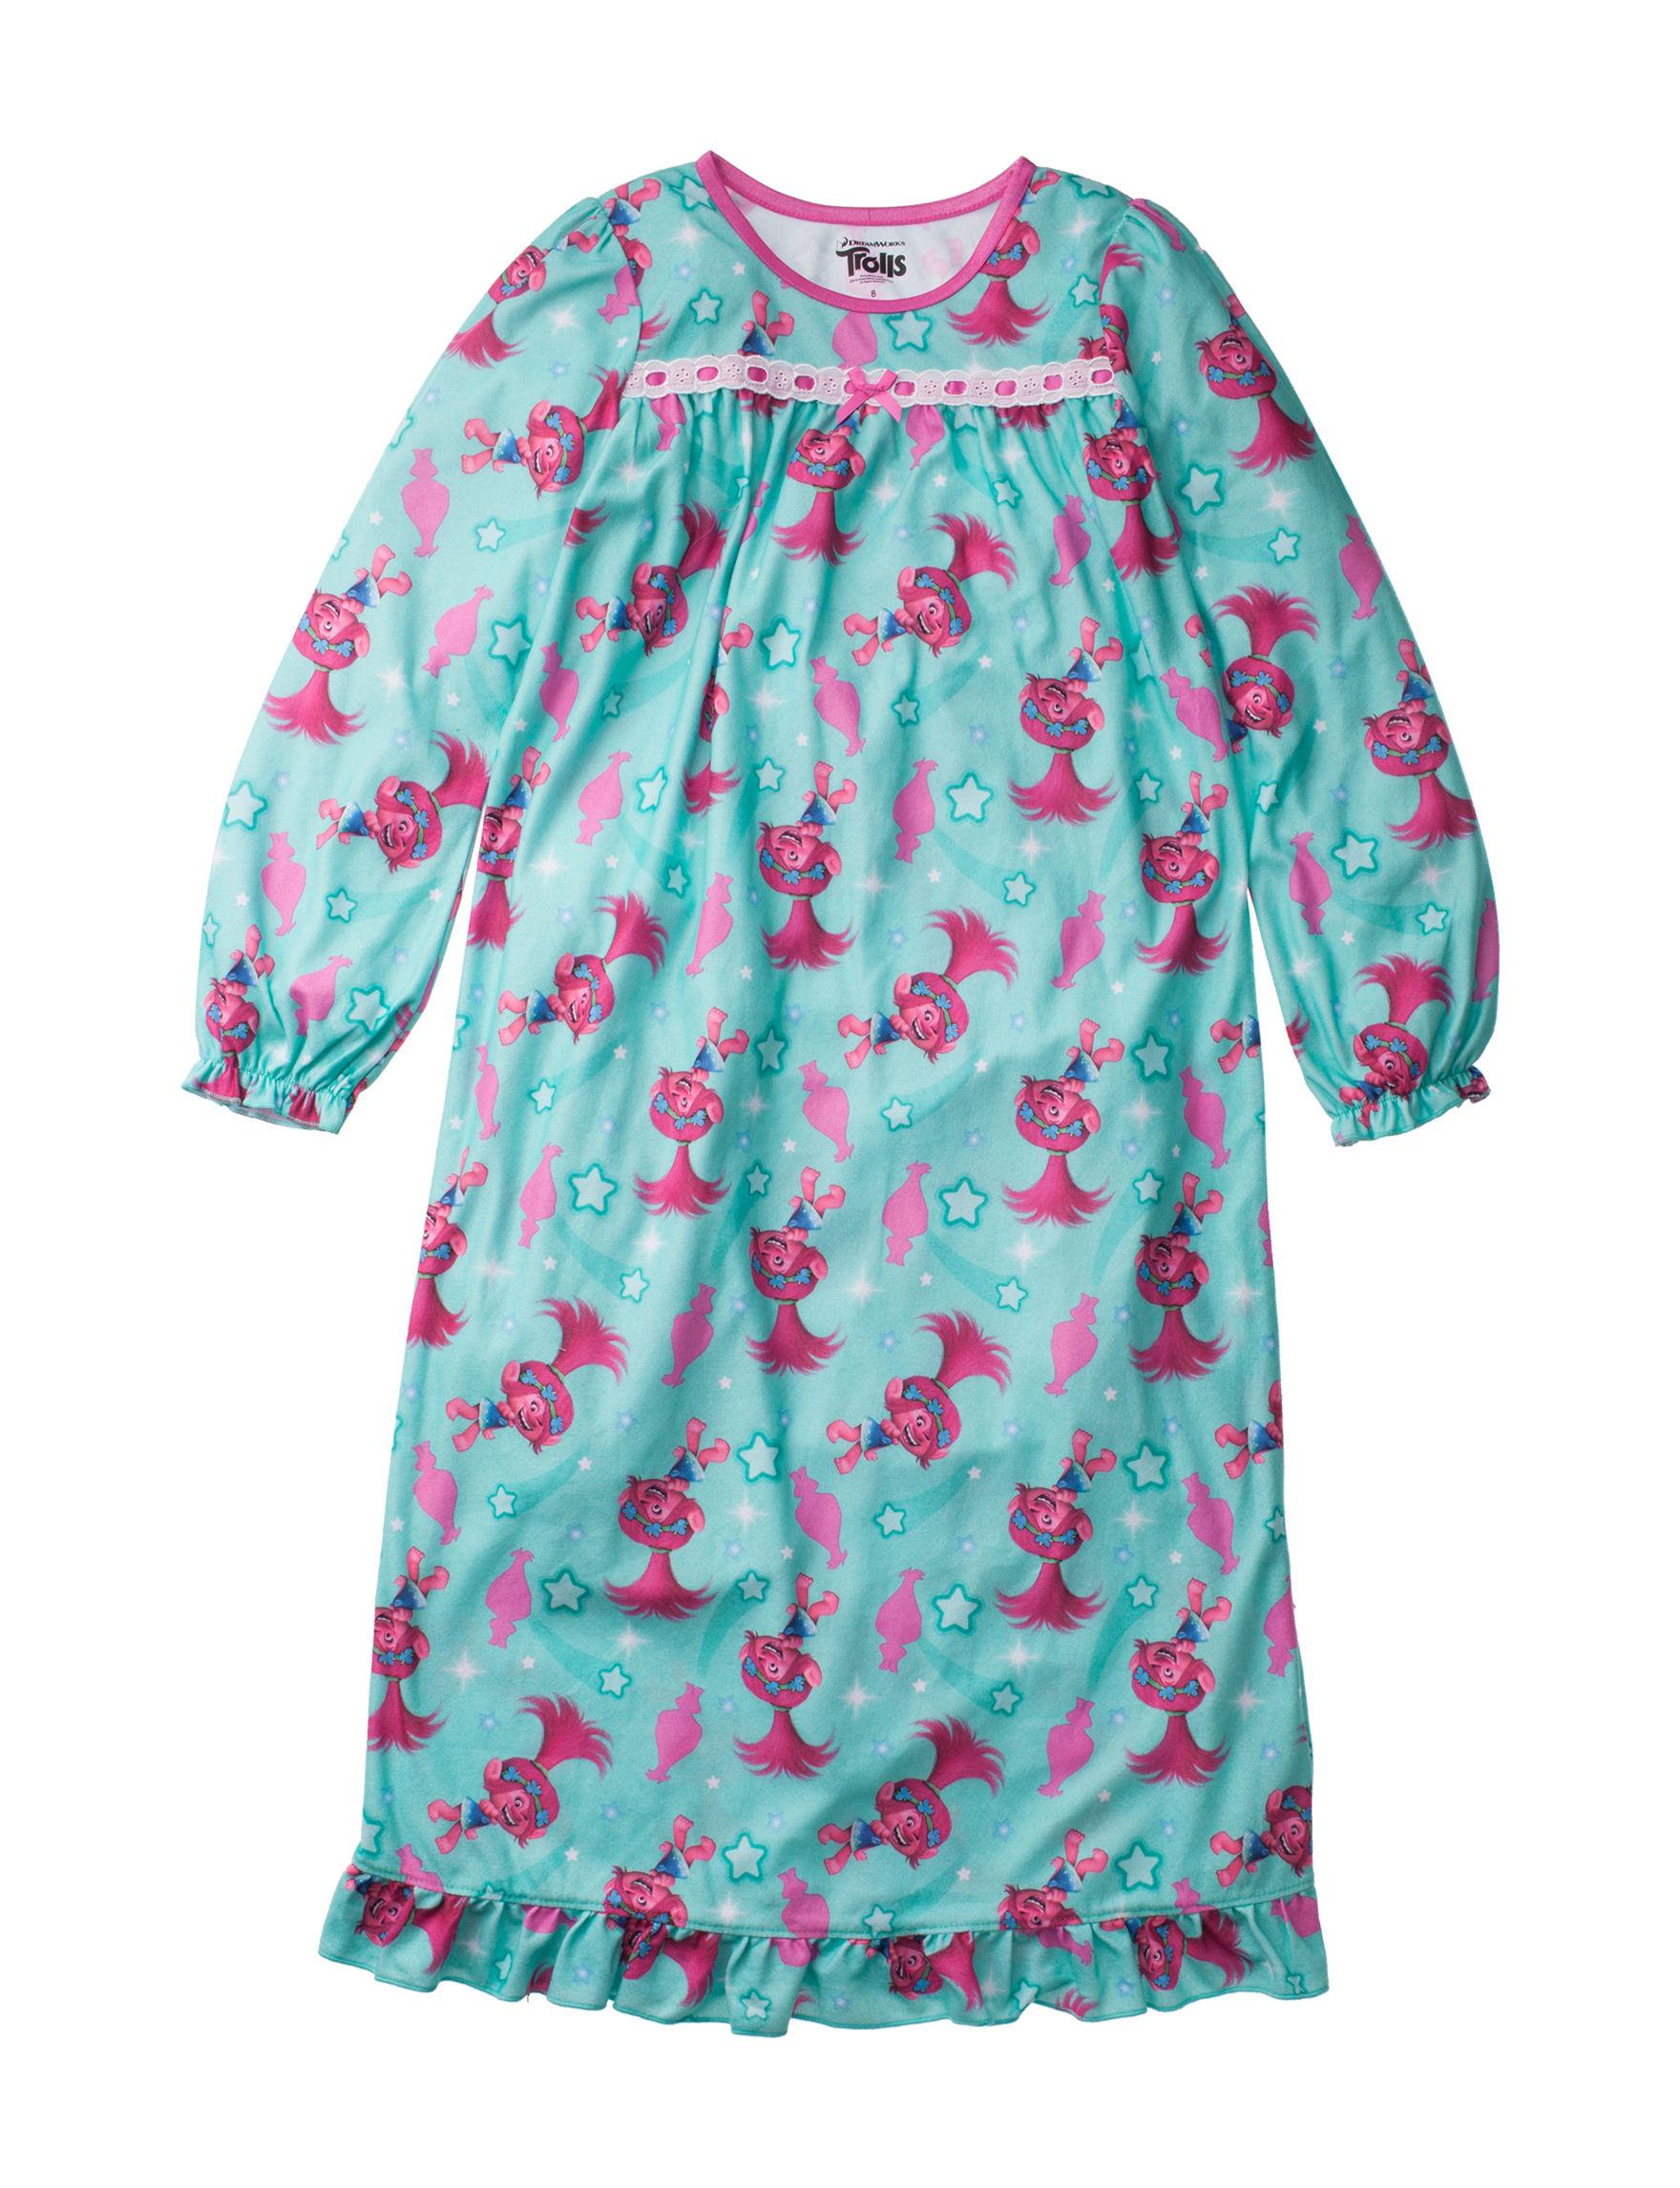 Licensed Aqua / Pink Nightgowns & Sleep Shirts